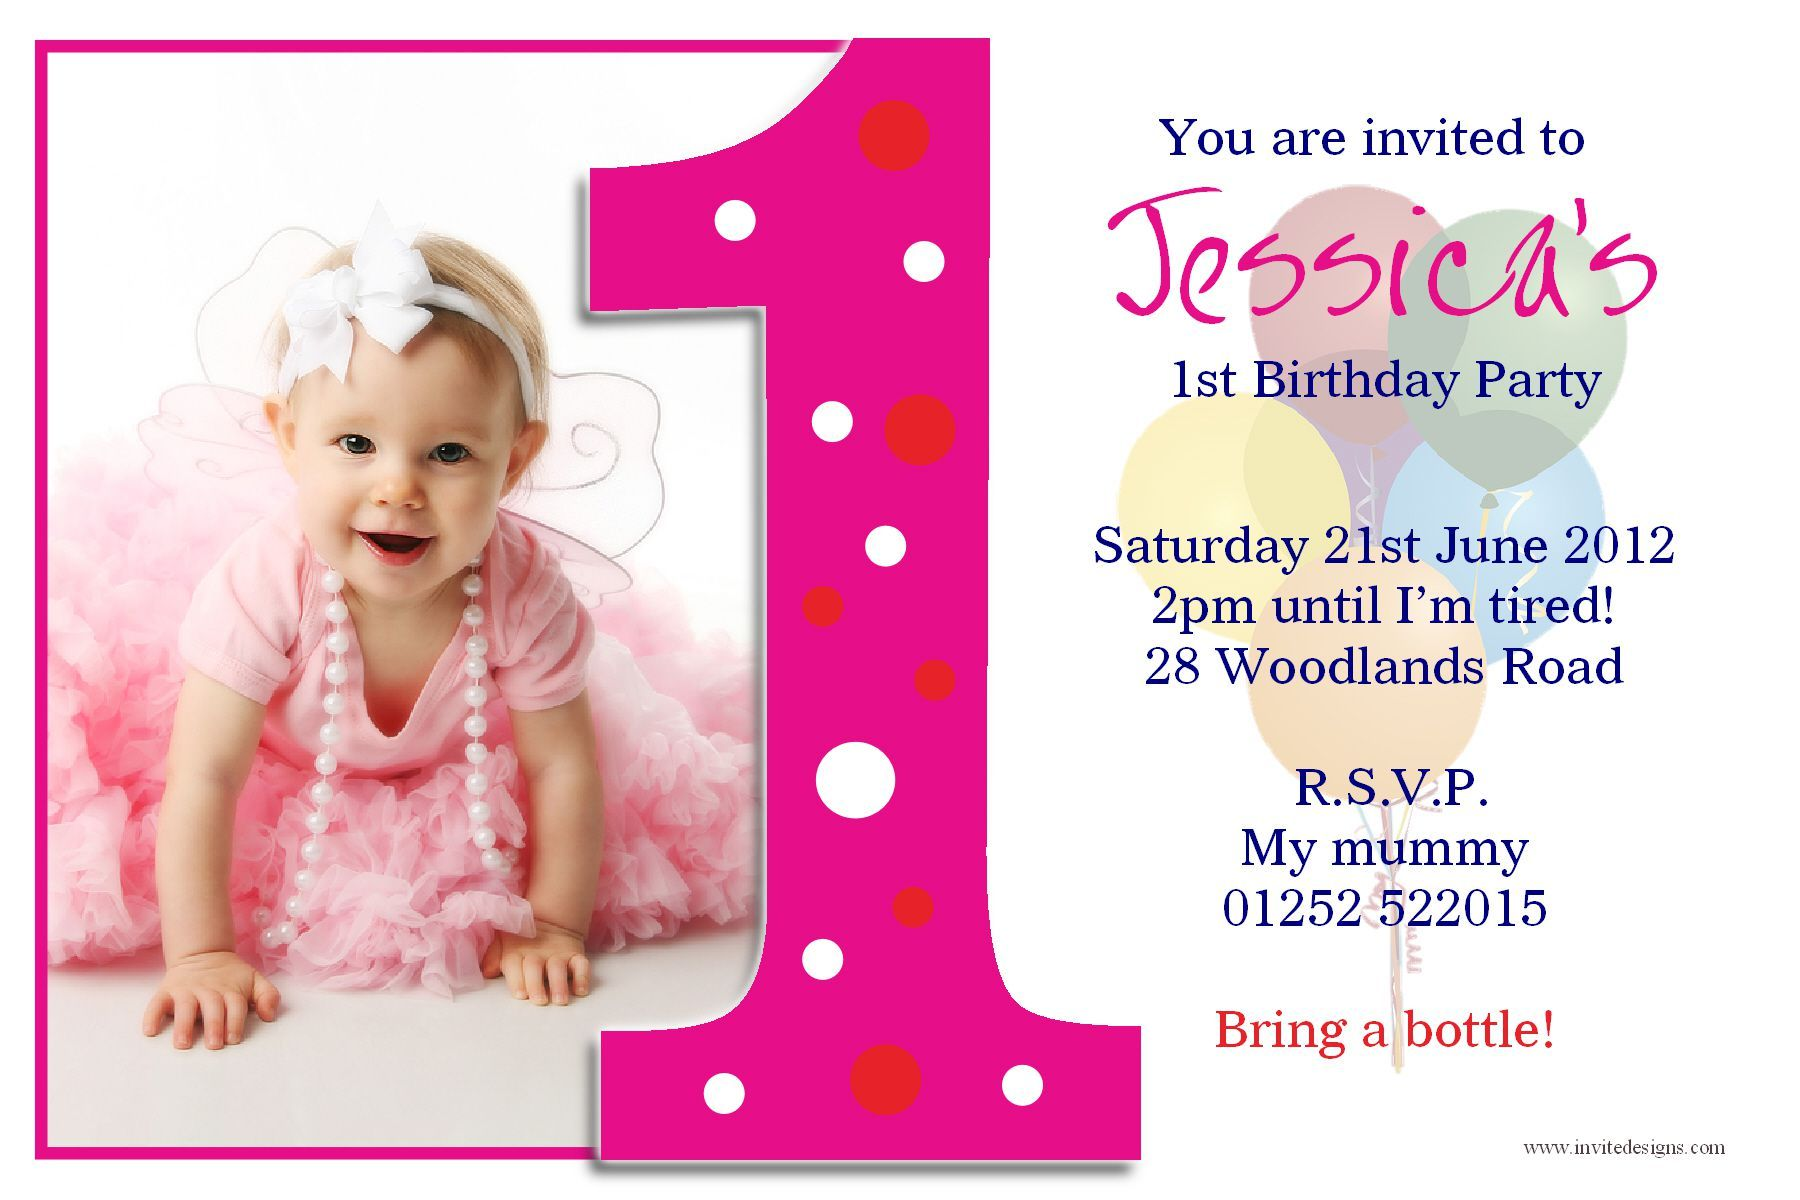 Birthday Party First Birthday Invitations Card